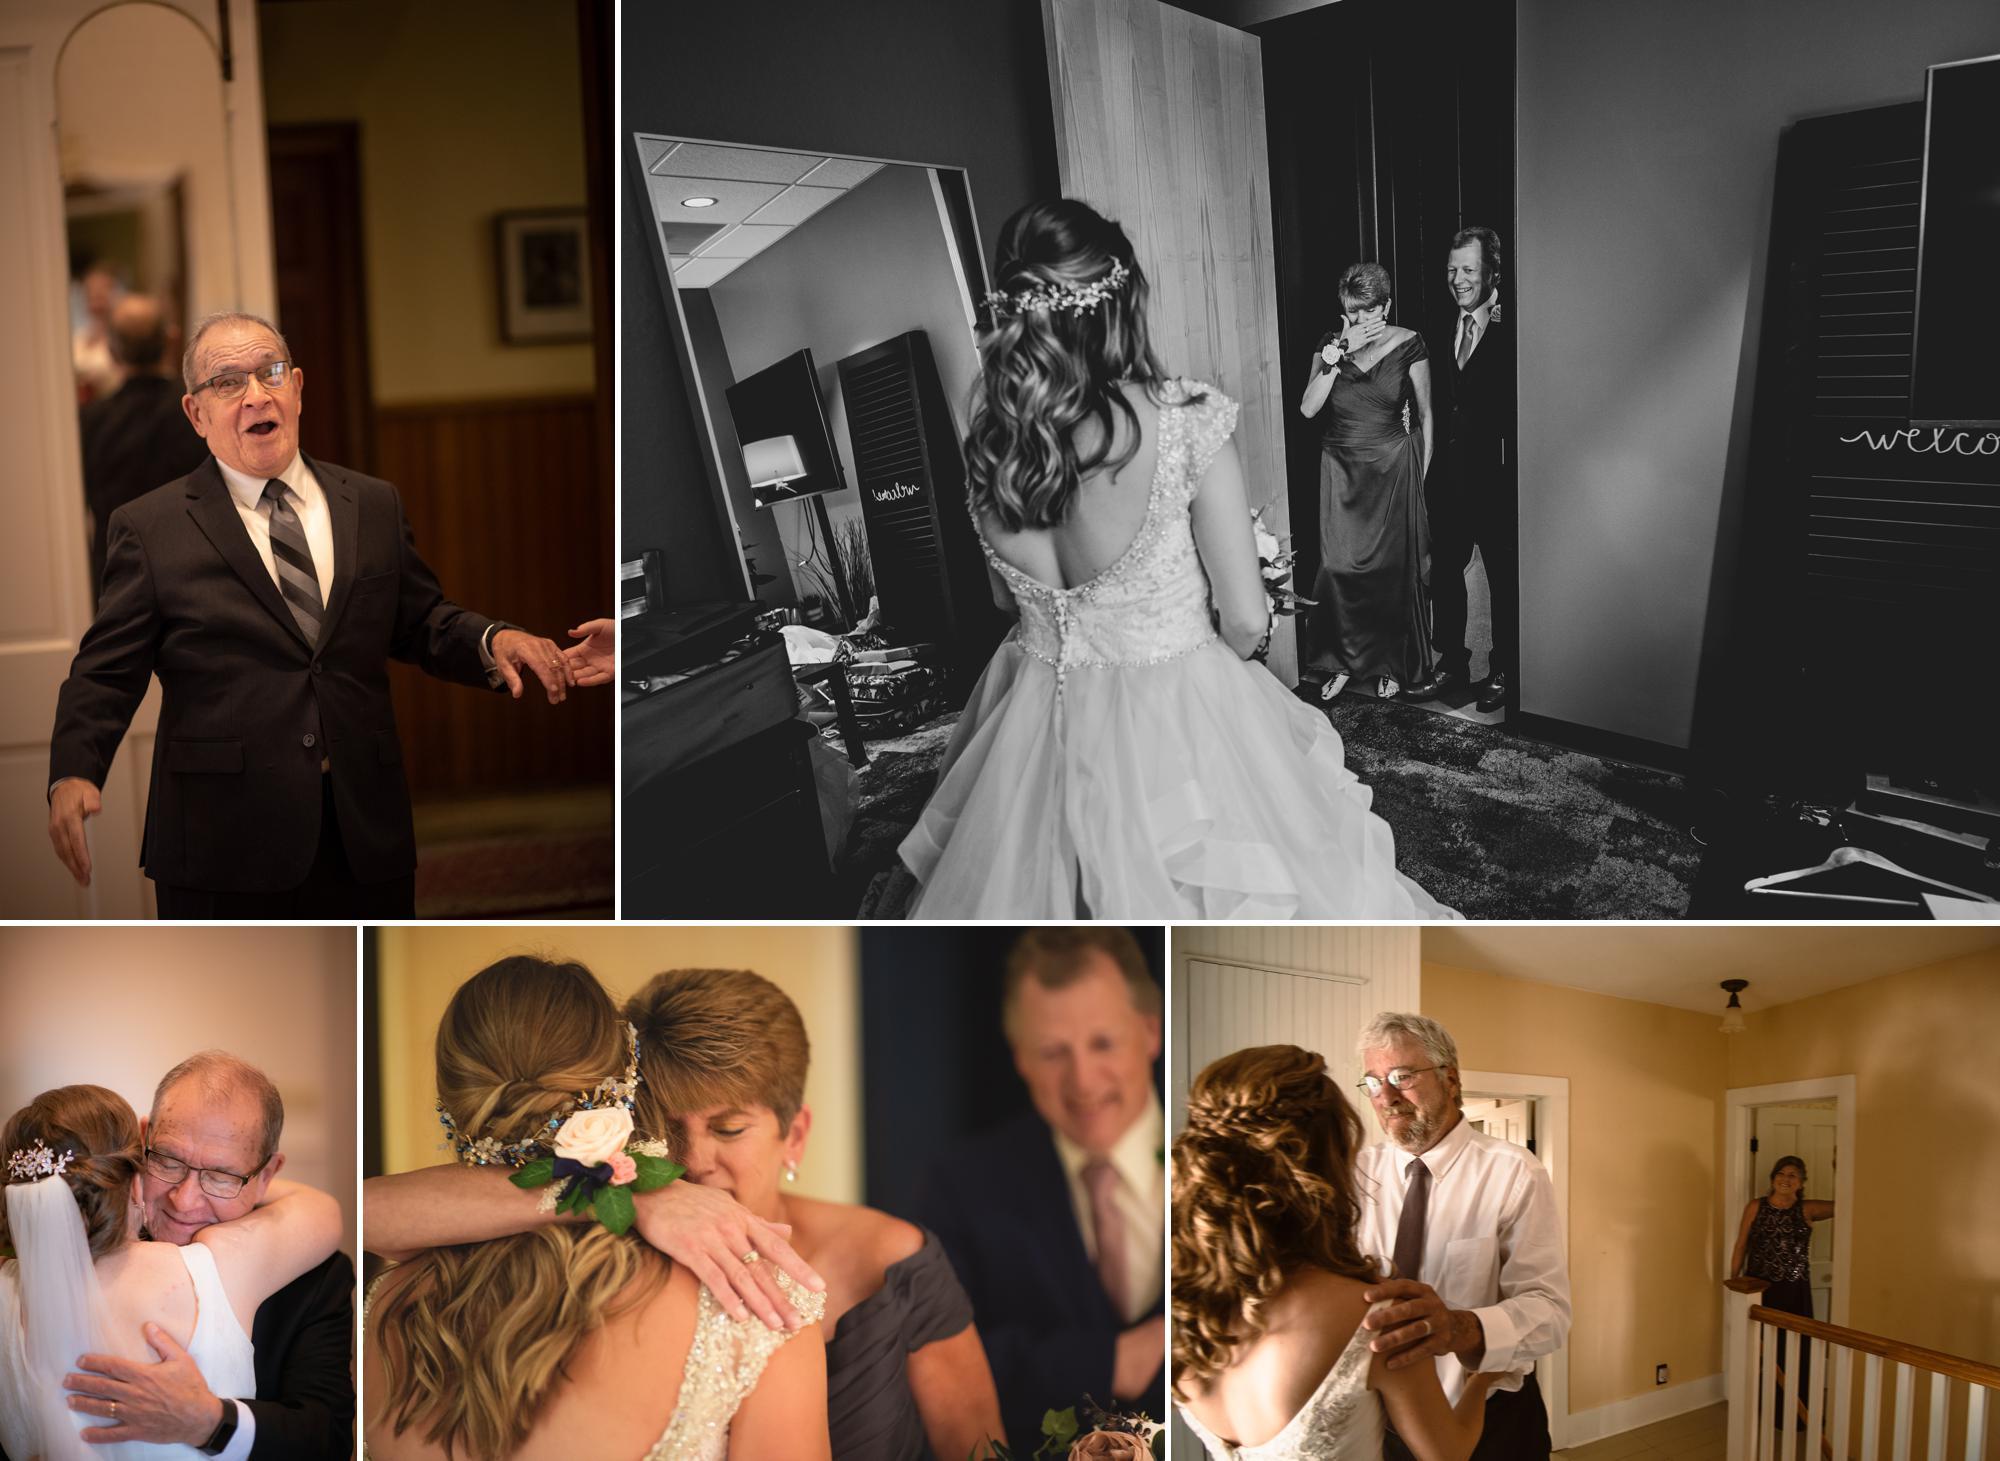 Wisconsin-Wedding-Photography-Blog-22